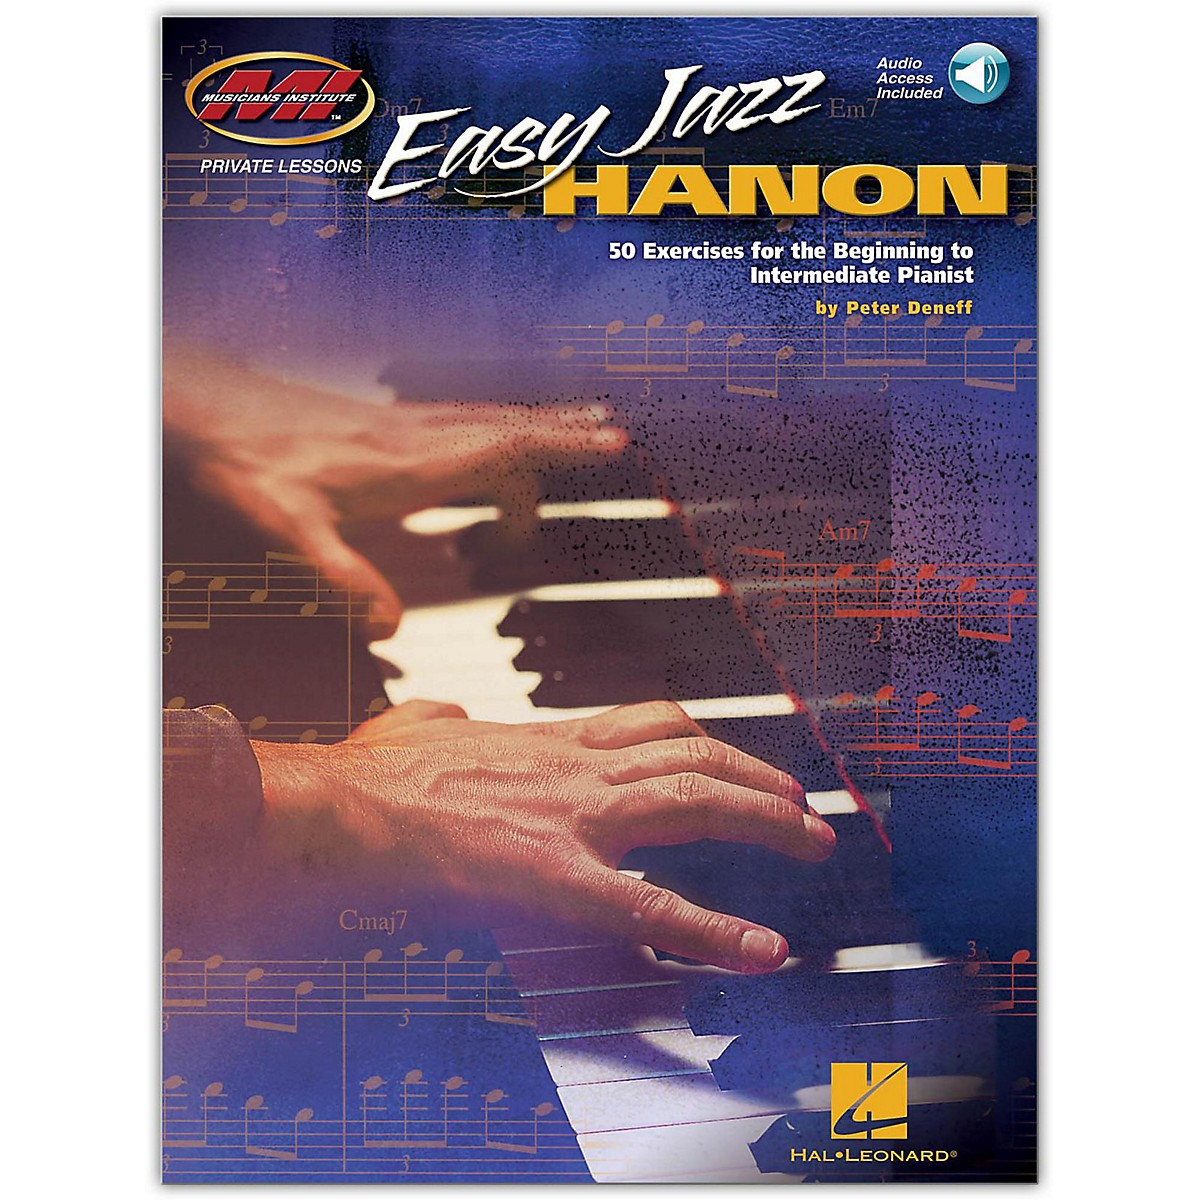 Hal Leonard Easy Jazz Hanon - 50 Exercises for the Beg to Int Pianist (Book/Audio Online)